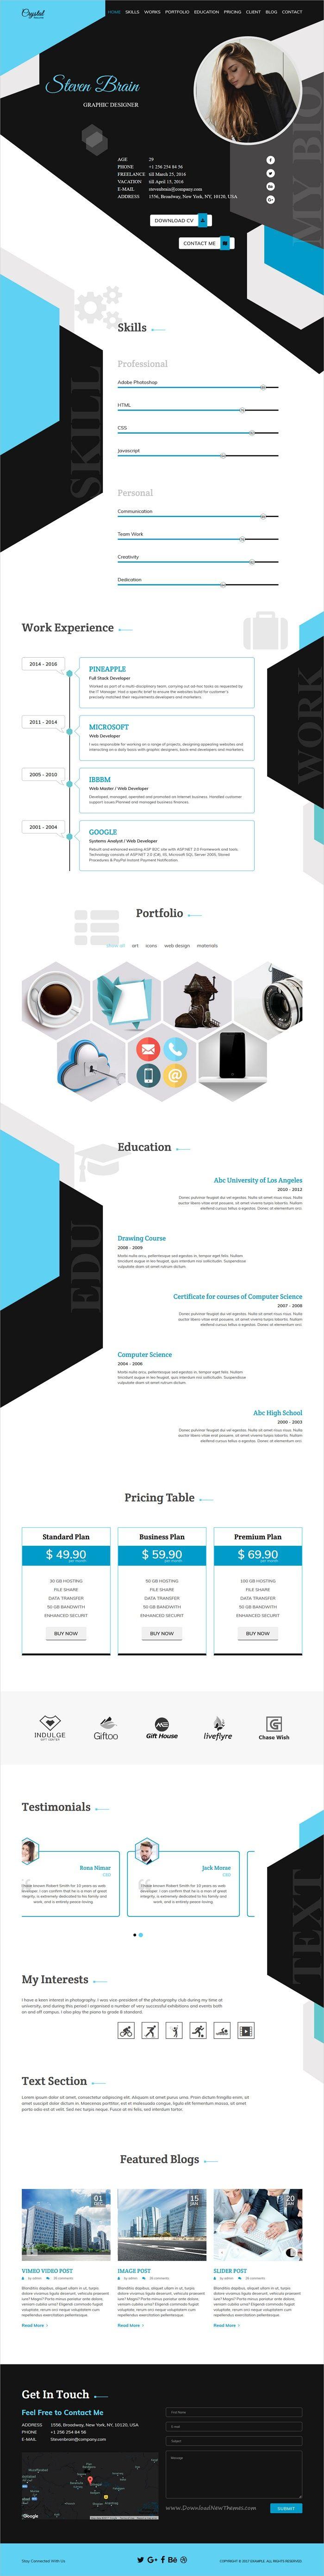 Crystal is a one page creative #Bootstrap HTML #portfolio & #CV / Resume template for Designer, Developer, Freelancer Artist, Photographer website download now➩ https://themeforest.net/item/crystal-creative-resume-cv-and-portfolio-html-template/19506943?ref=Datasata